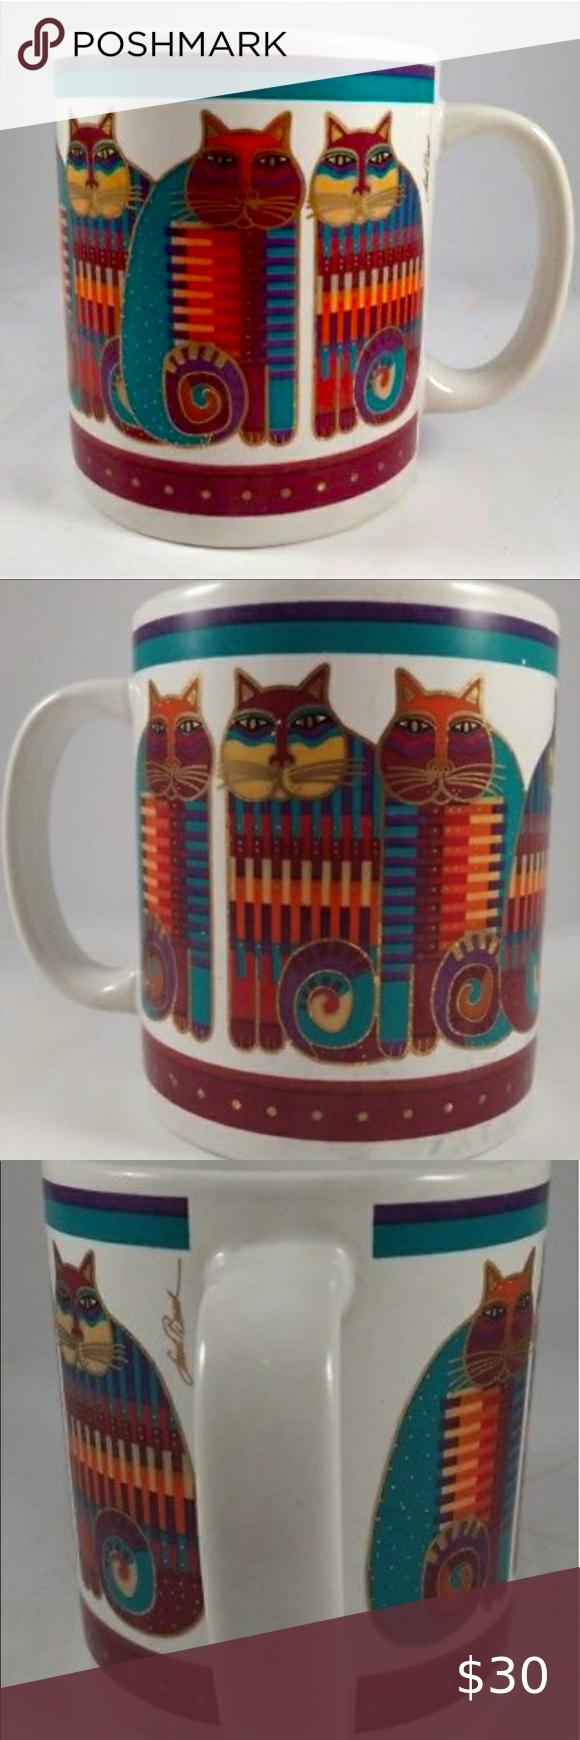 Laurel Burch Vintage Rainbow Cat S Cousin Mug In 2020 Rainbow Cat Laurel Burch Vintage Materials